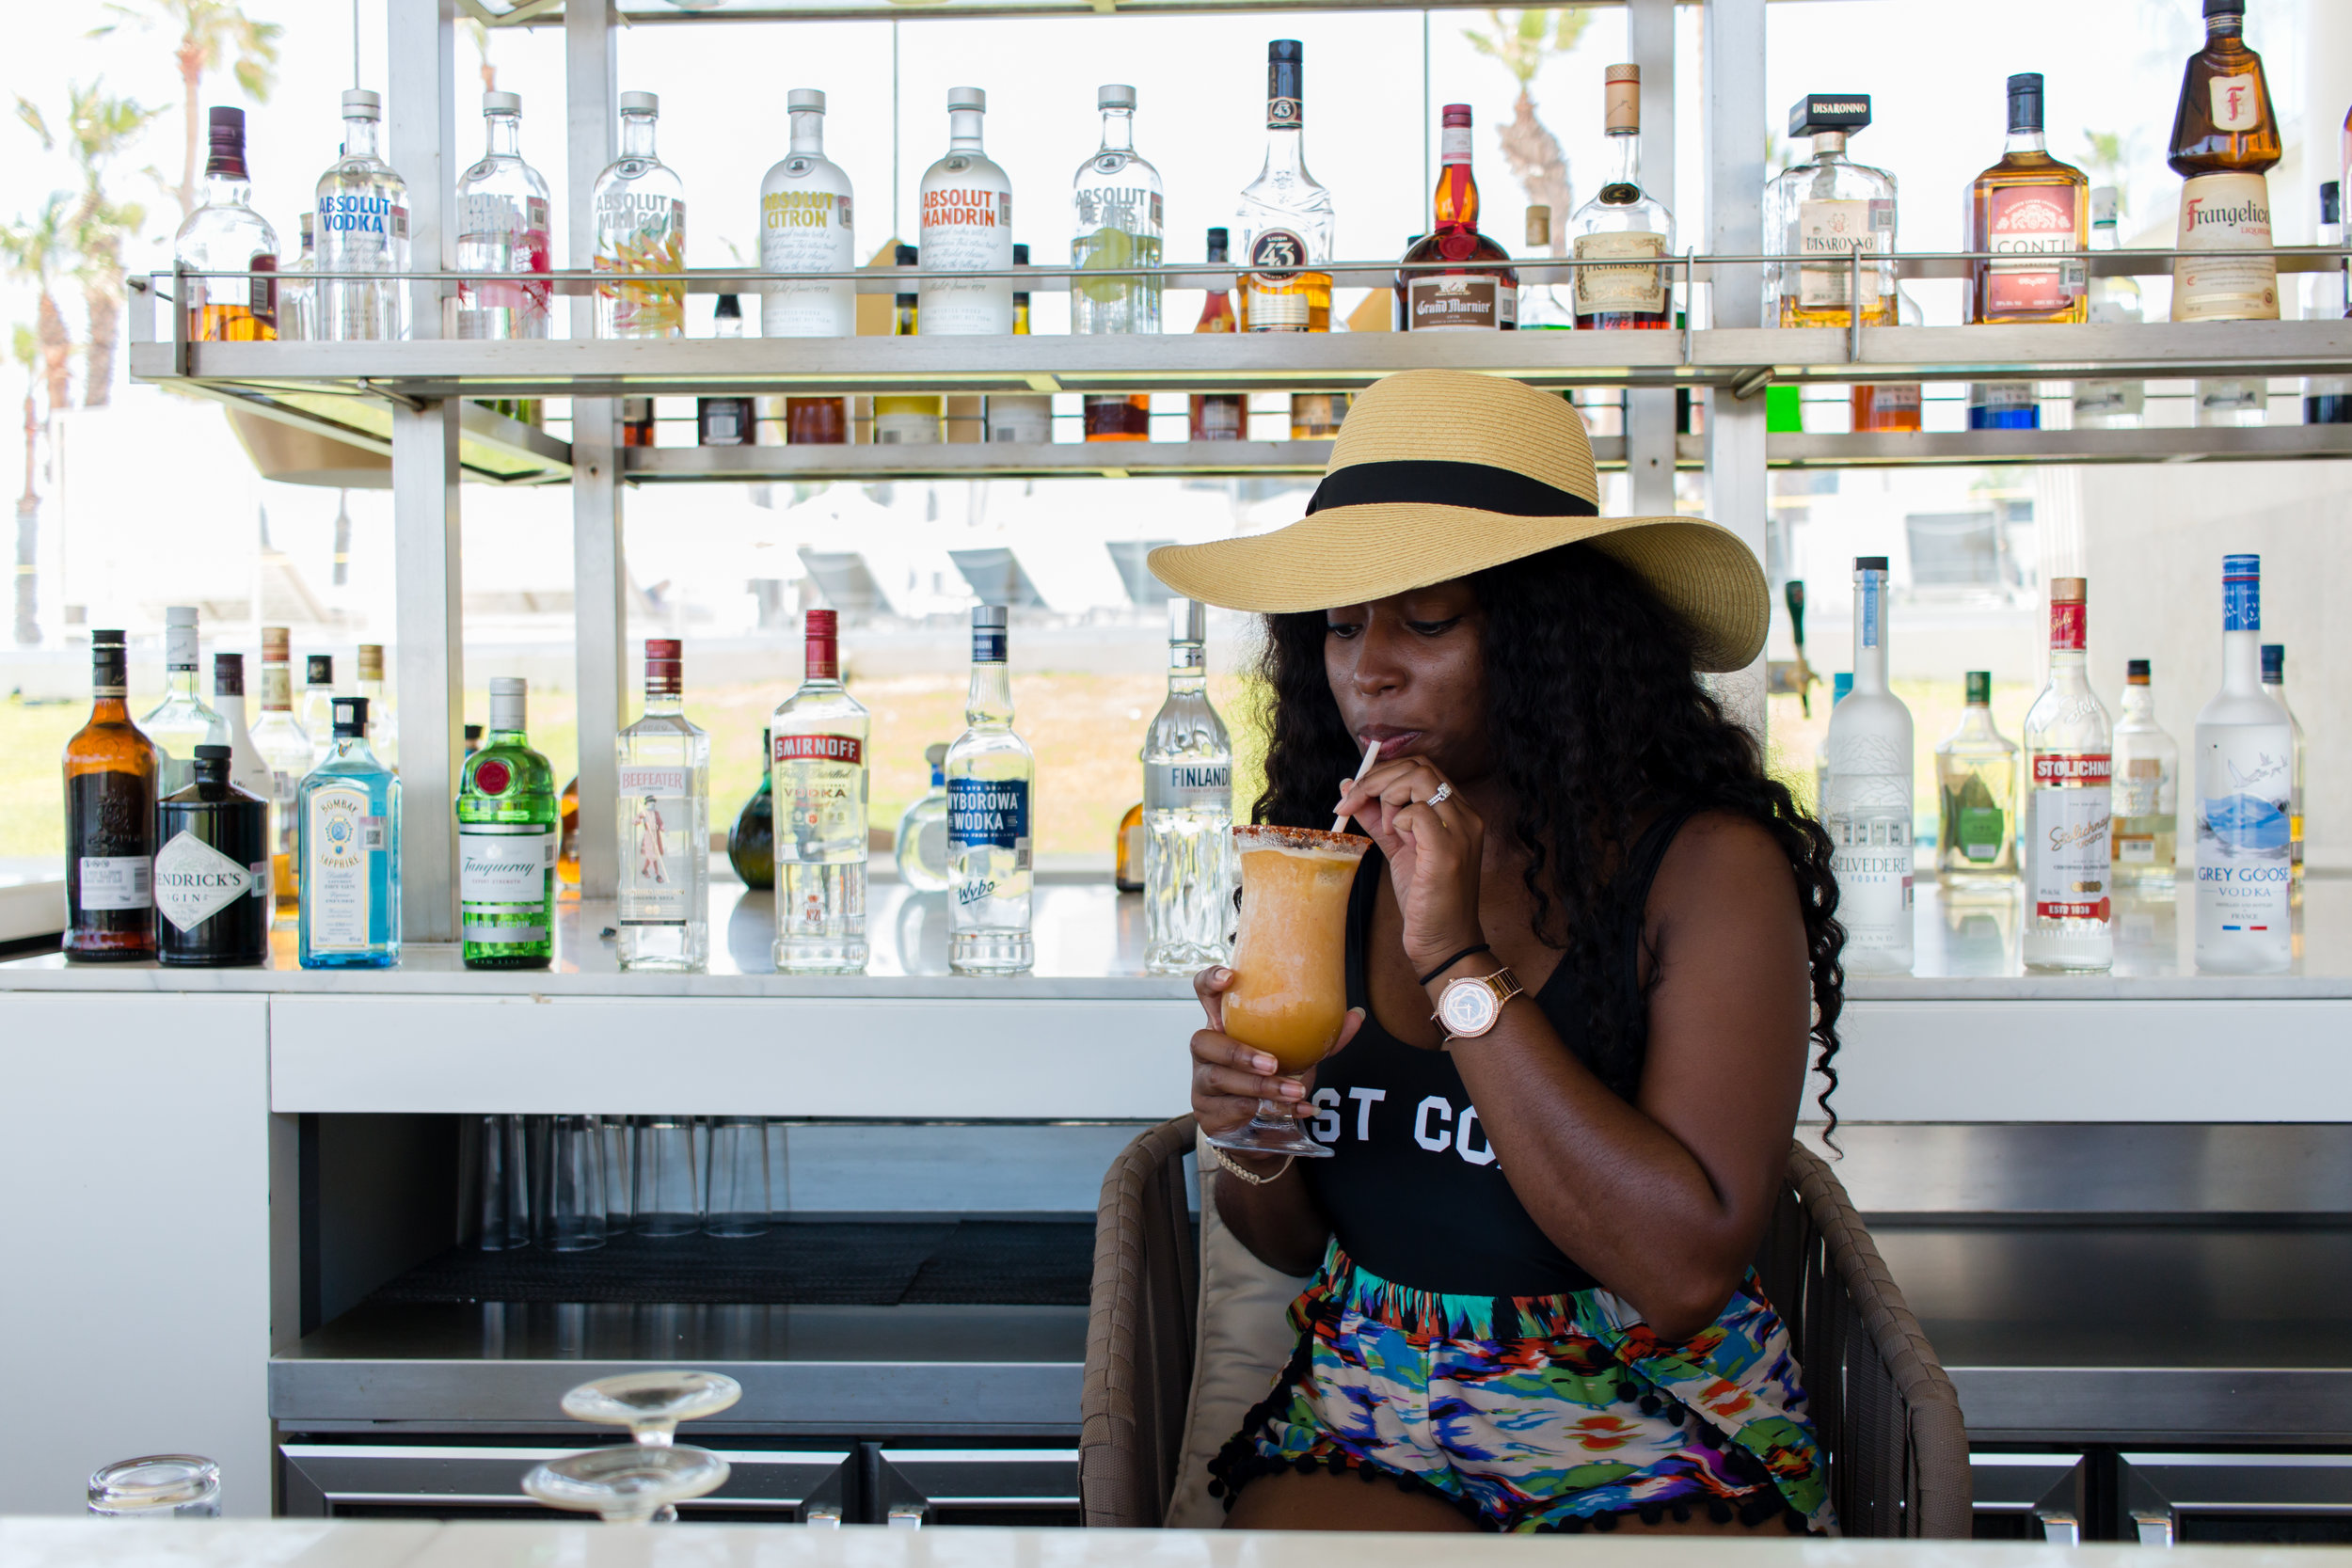 Enjoying a drink behind the bar